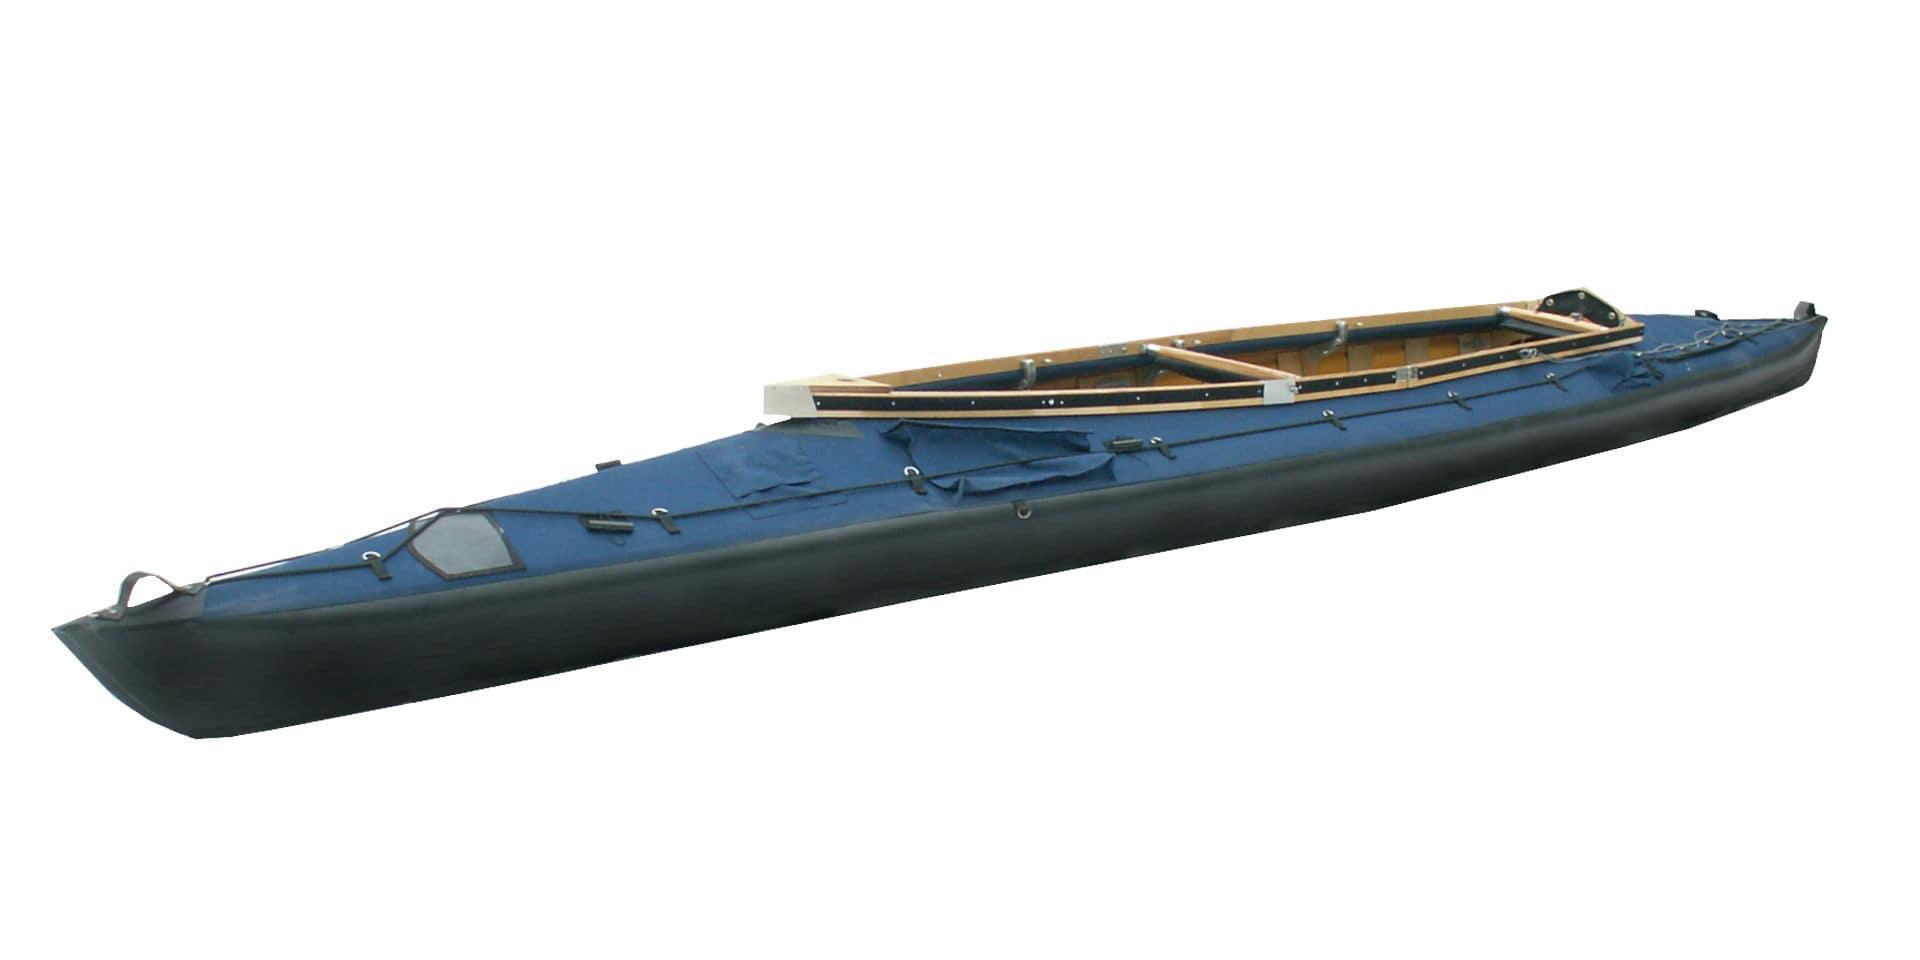 Folding kayak / sea / expedition / two-seater AMAZON II 600 XXL Wayland  Folding Kayaks